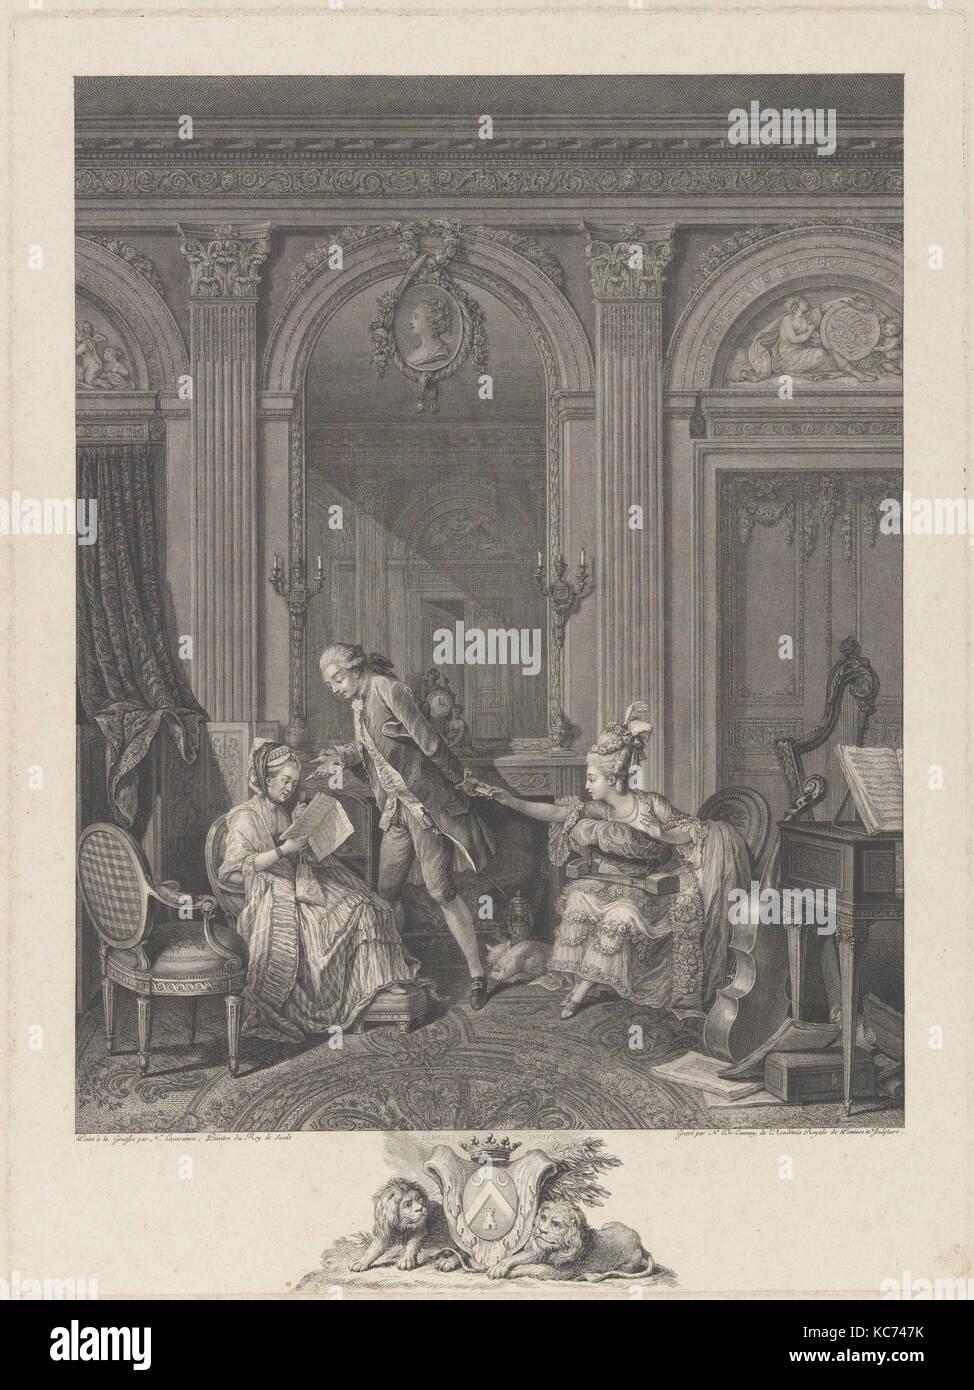 Le Billet doux, 1778, Etching and engraving, Prints, Nicolas de Launay (French, Paris, 1739–1792), after Nicolas - Stock Image